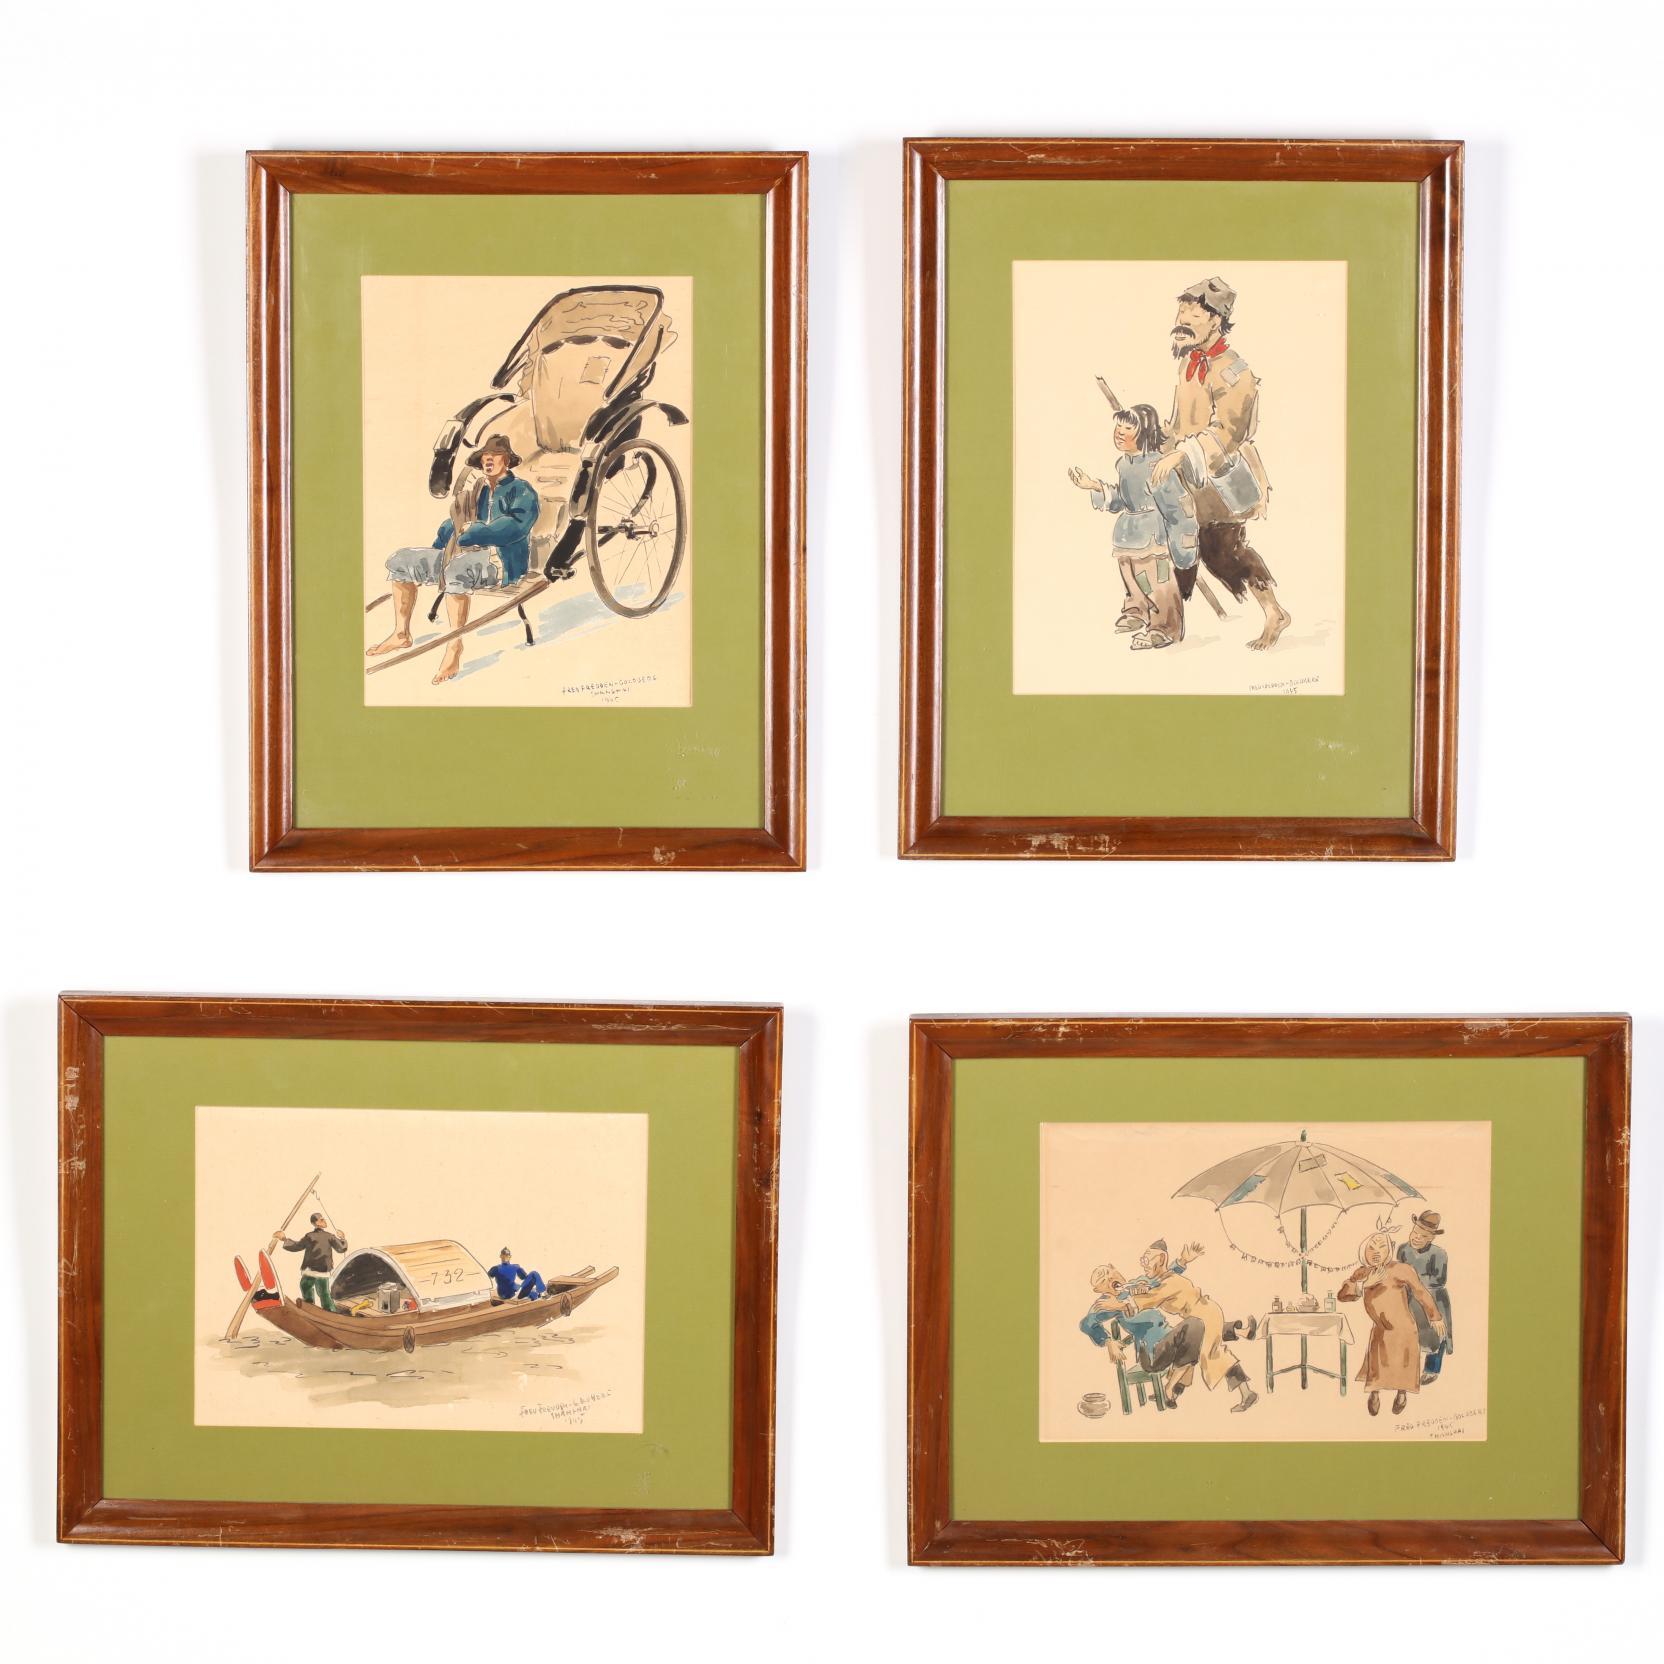 fred-fredden-goldberg-germany-ca-1889-1973-four-shanghai-caricatures